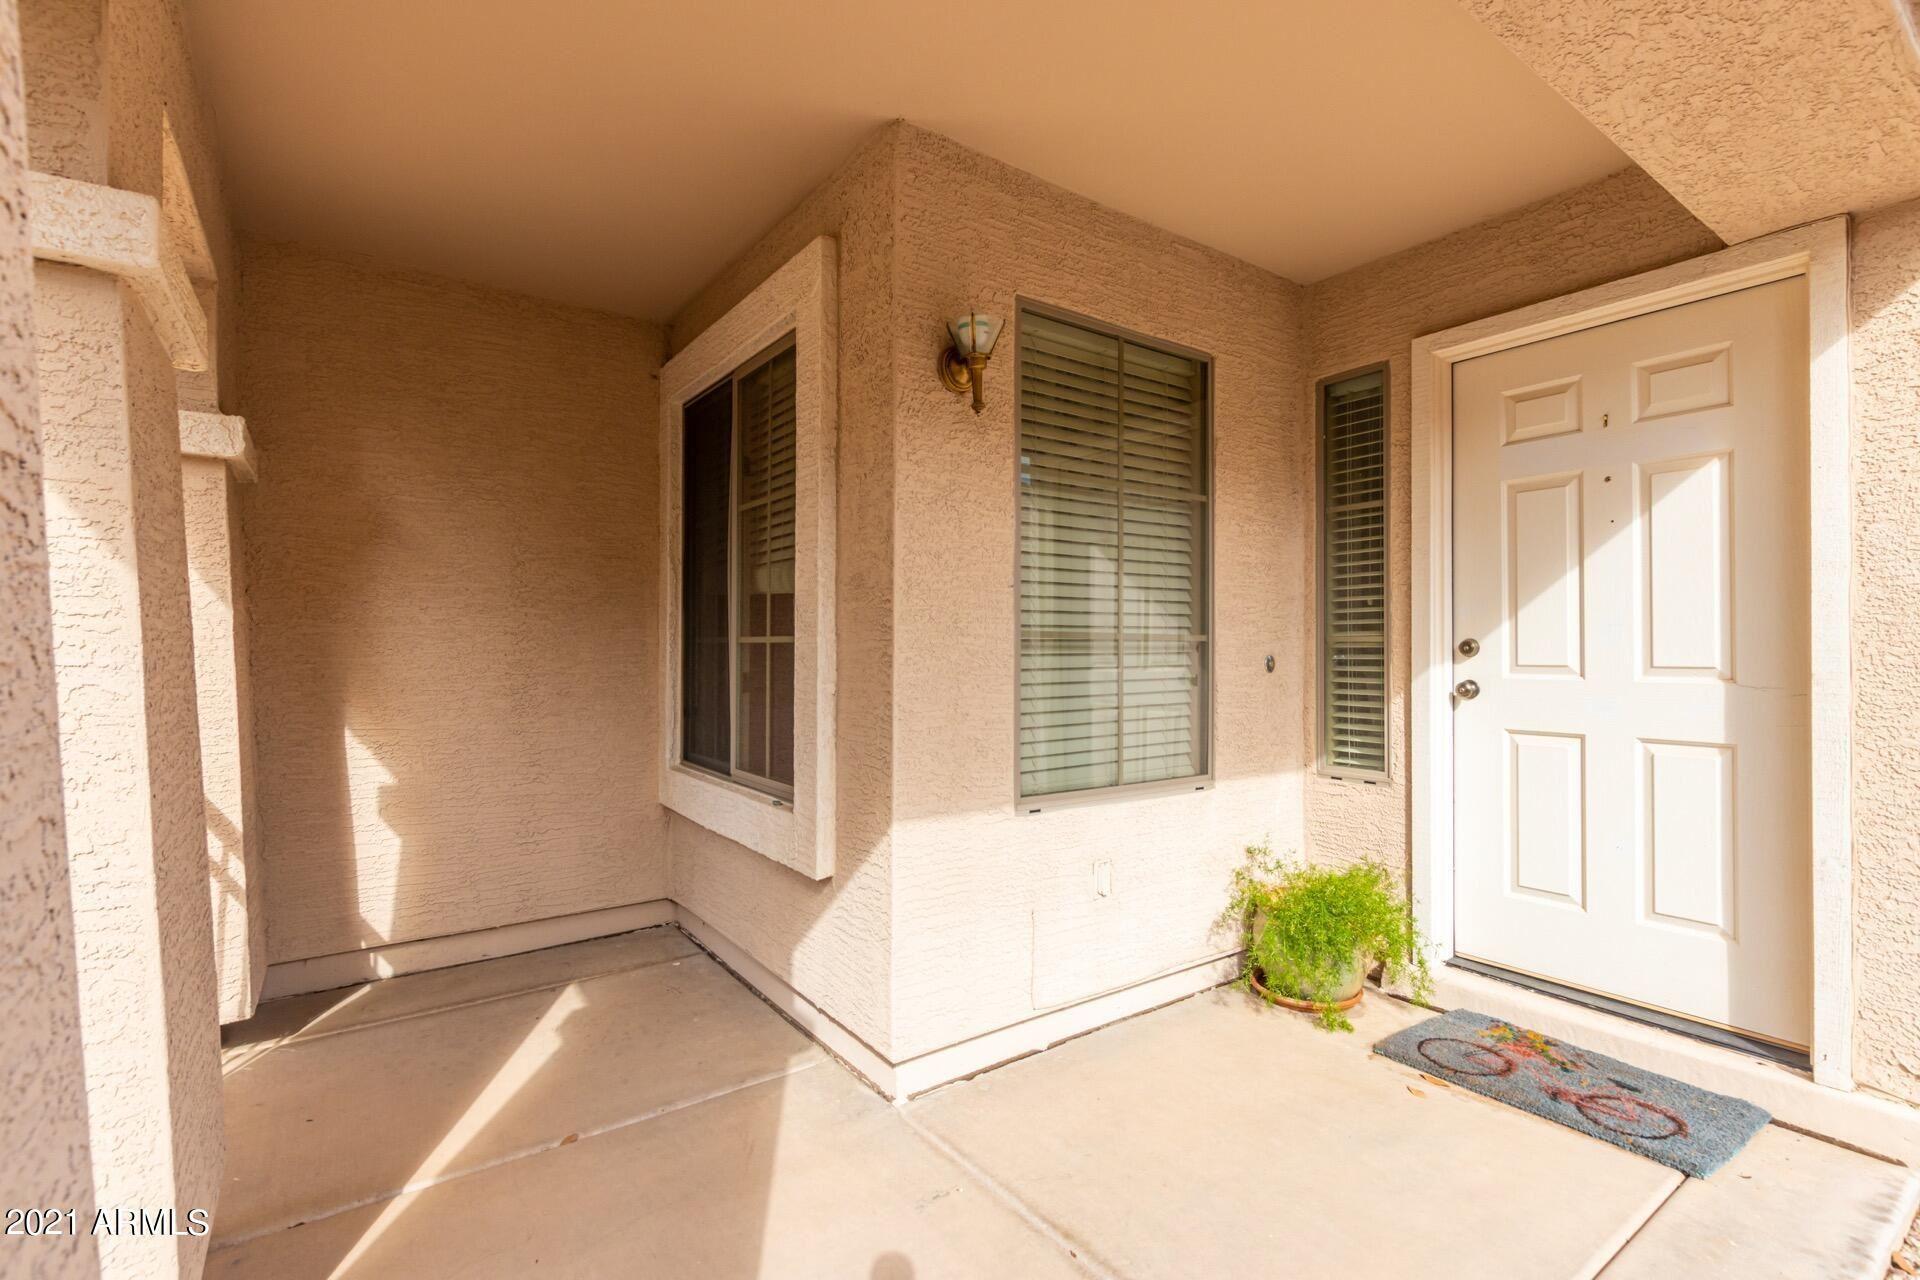 Photo of 2588 W SAWTOOTH Way, Queen Creek, AZ 85142 (MLS # 6296433)